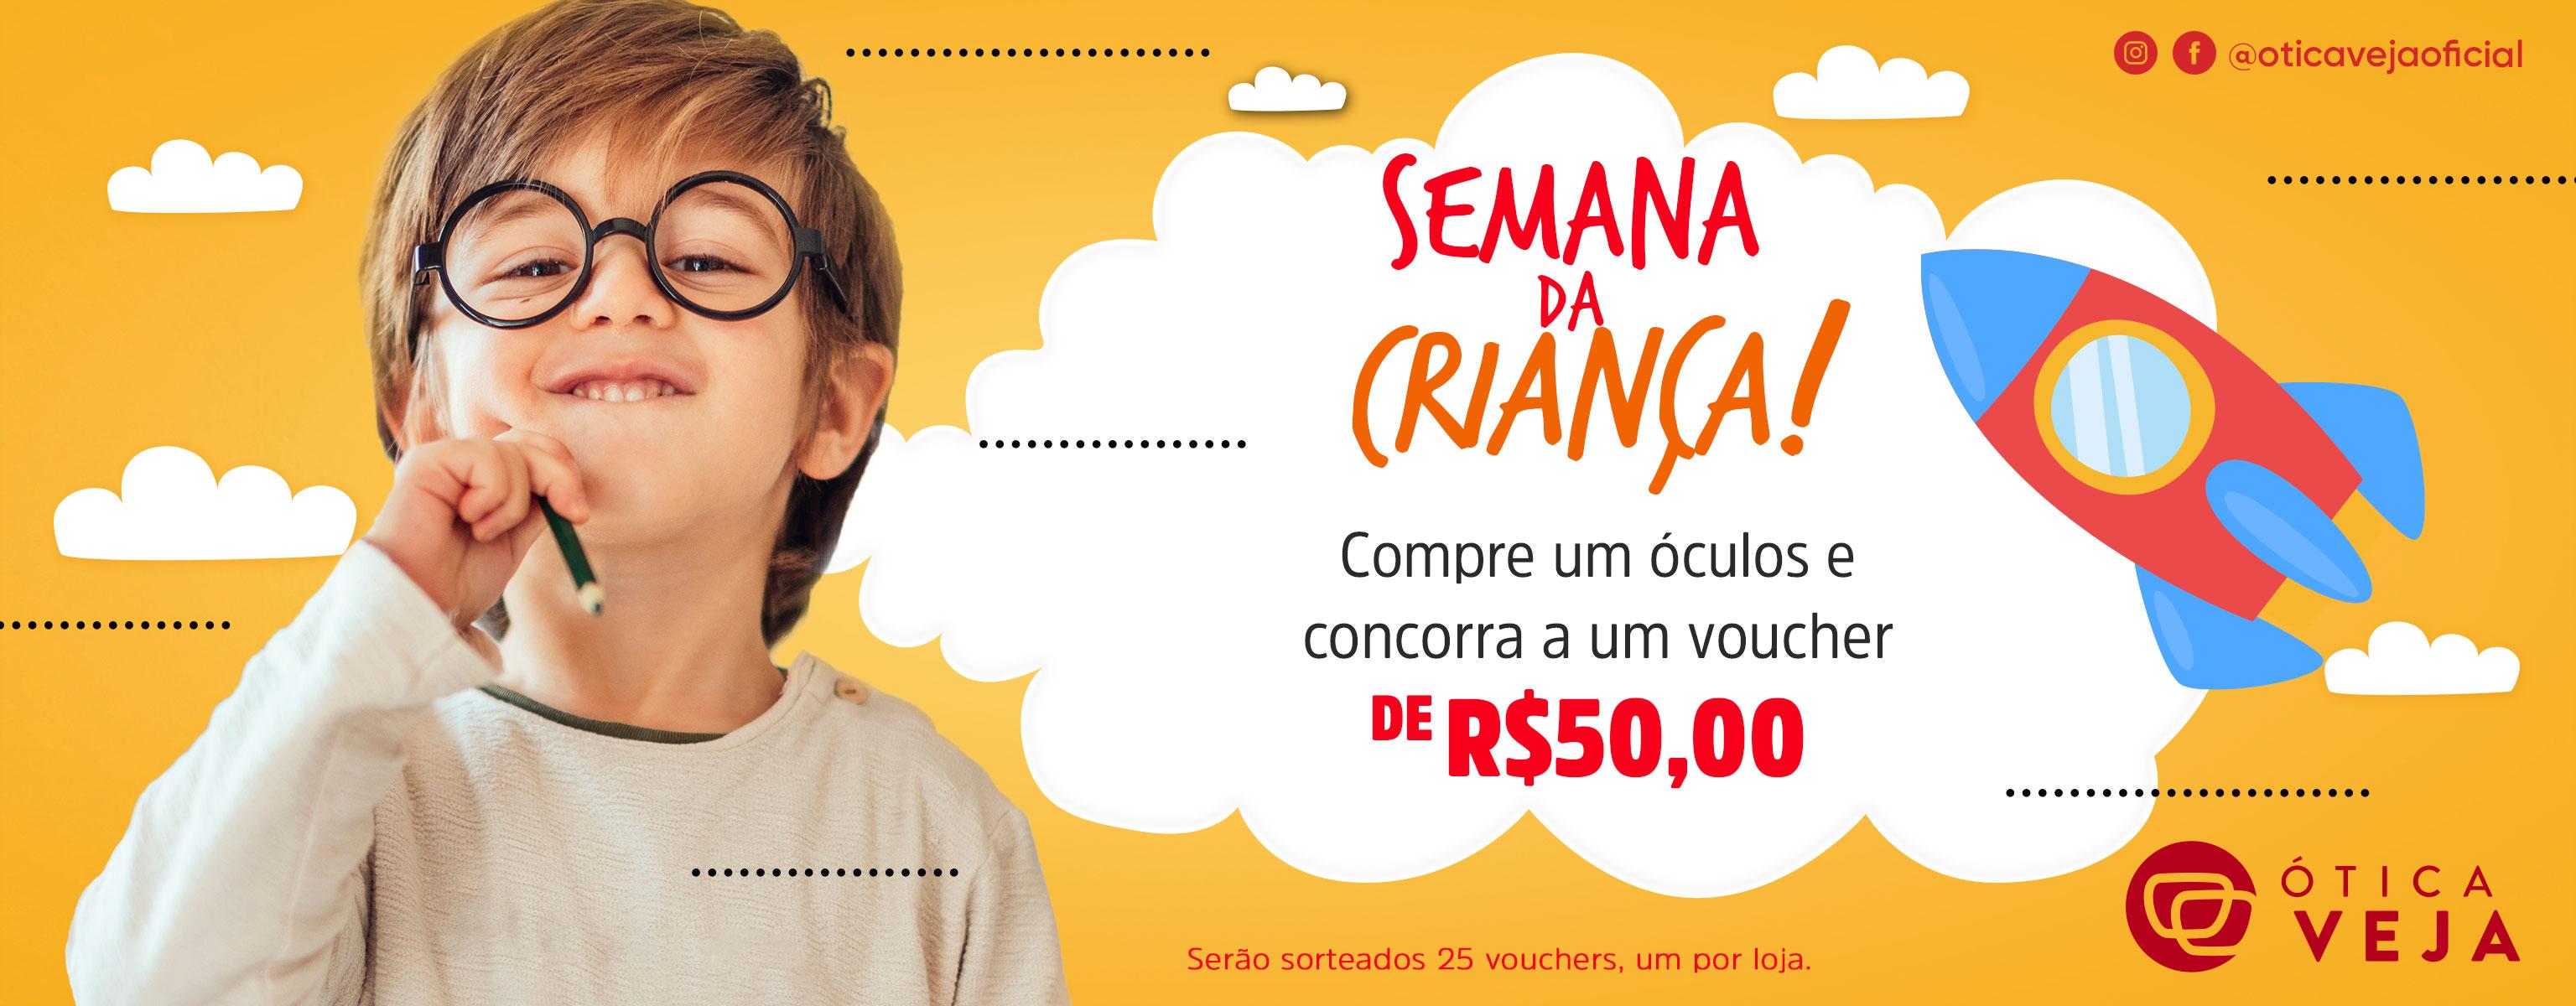 #semana-da-criança